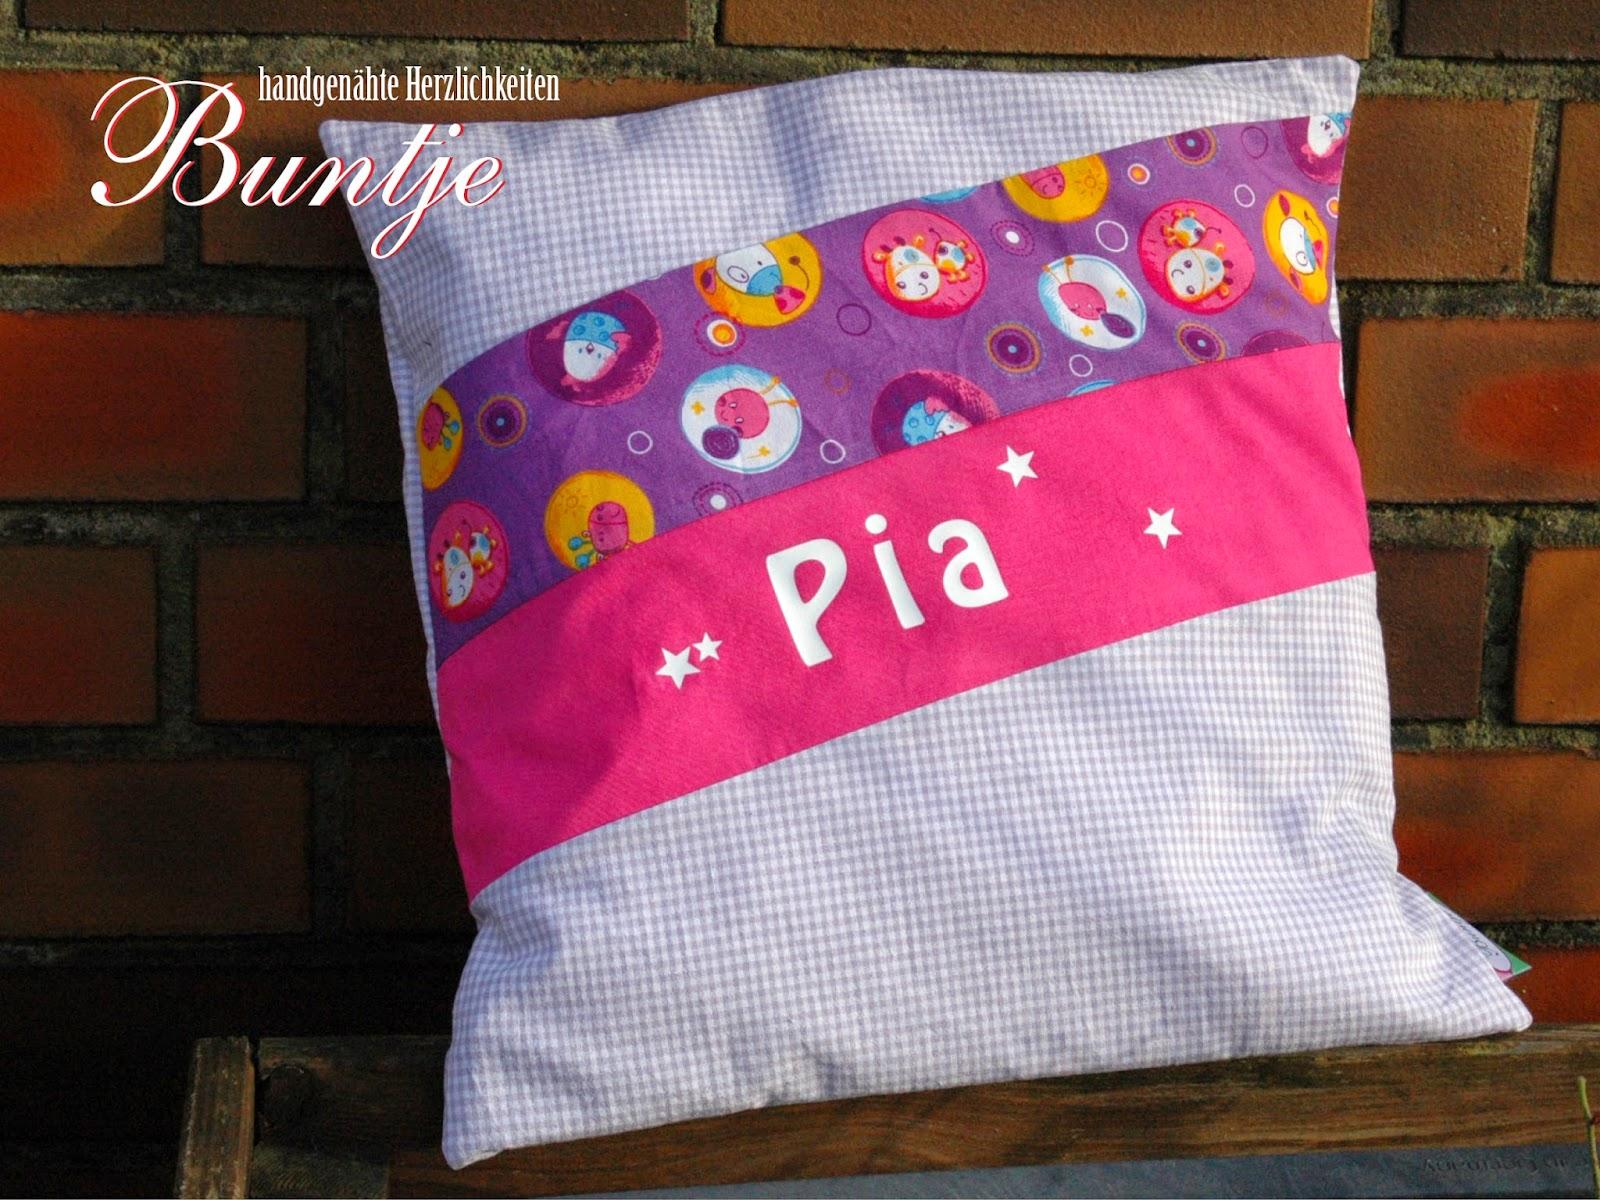 Namenskissen Kissen Name Geschenk Geburt Taufe Geburtstag Mädchen lila pink rosa Tiere Pia Stern Buntje nähen handmade